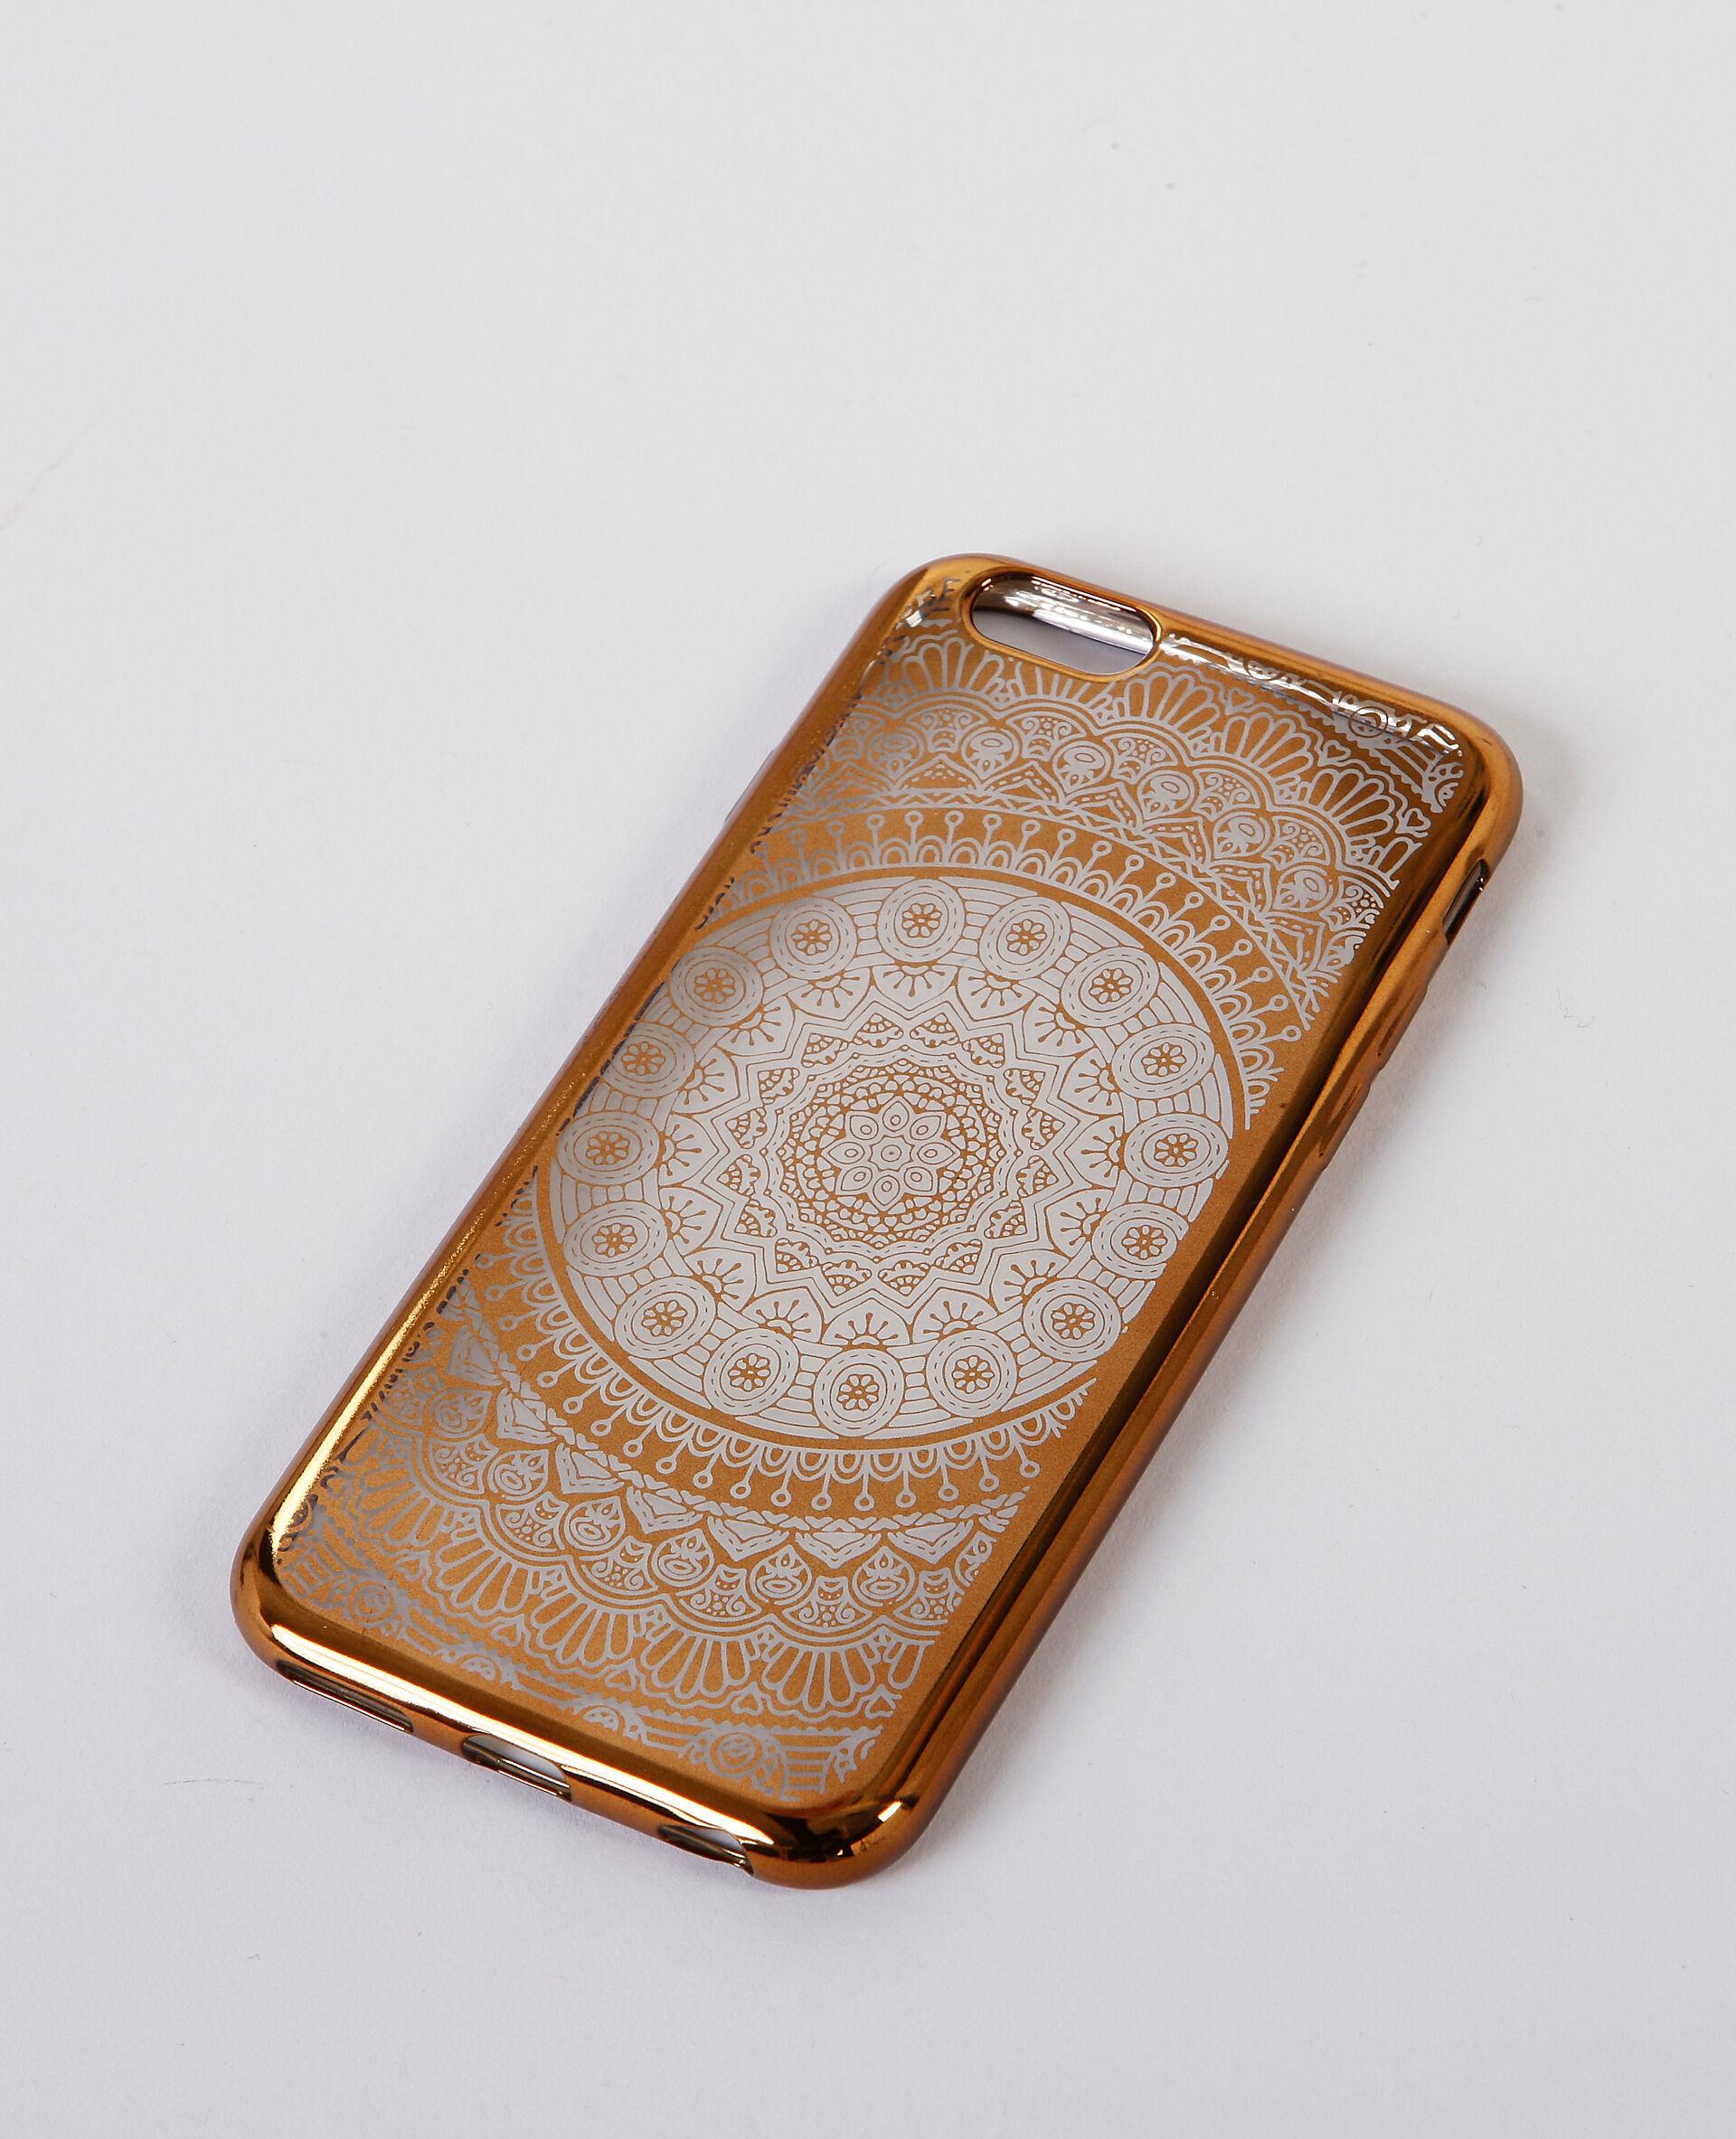 iphone 6 coque doré